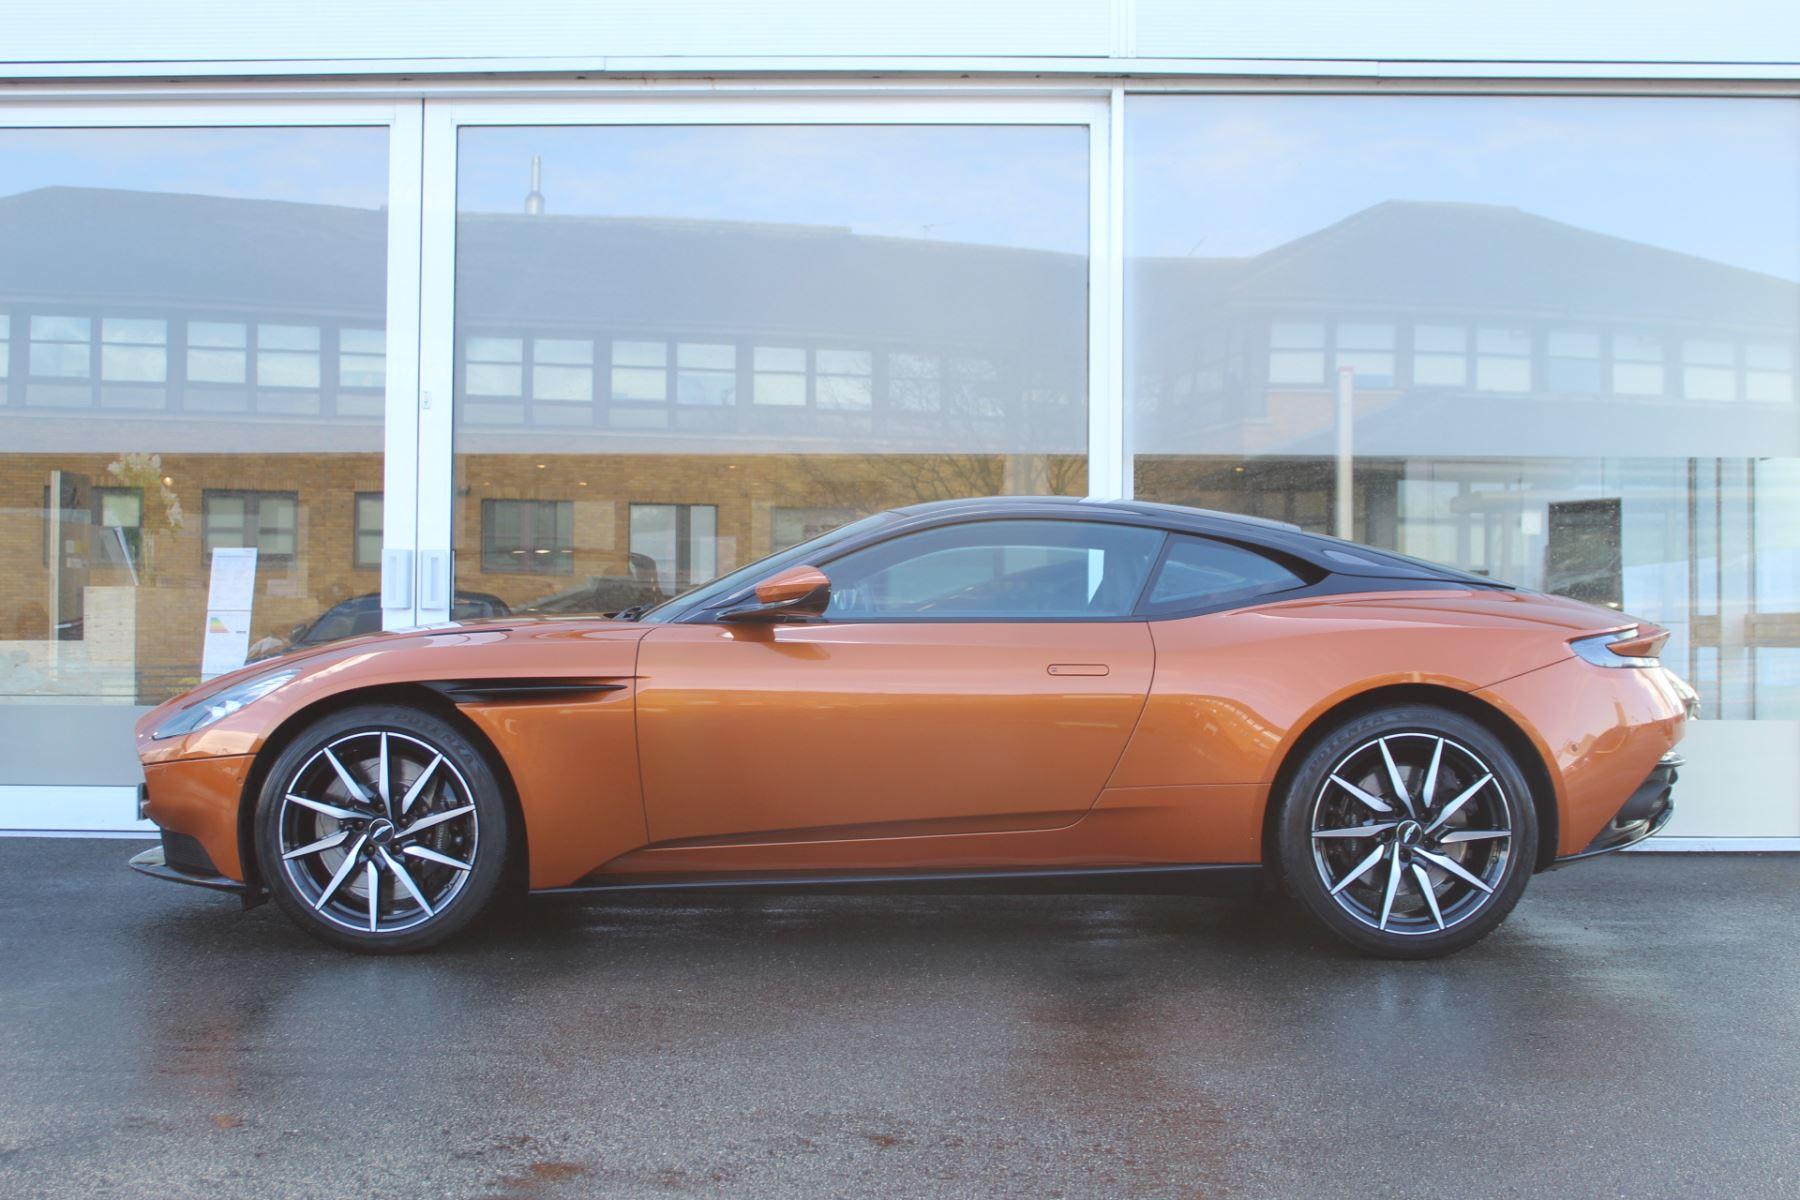 Aston Martin DB11 V12 2dr Touchtronic image 7